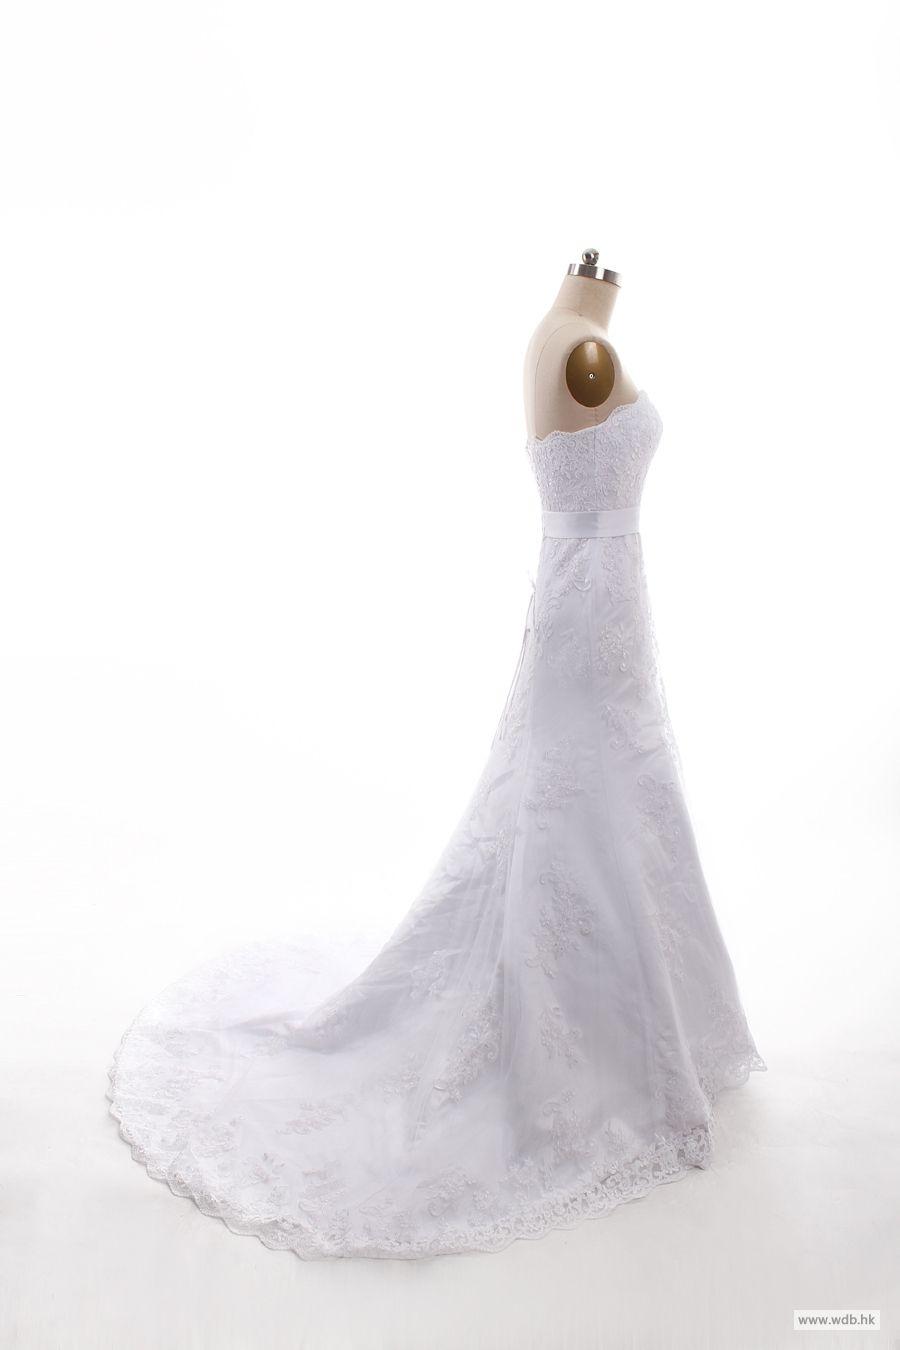 Dropped waist wedding dress  disney wedding Pretty Sleeveless with Dropped waist wedding dress